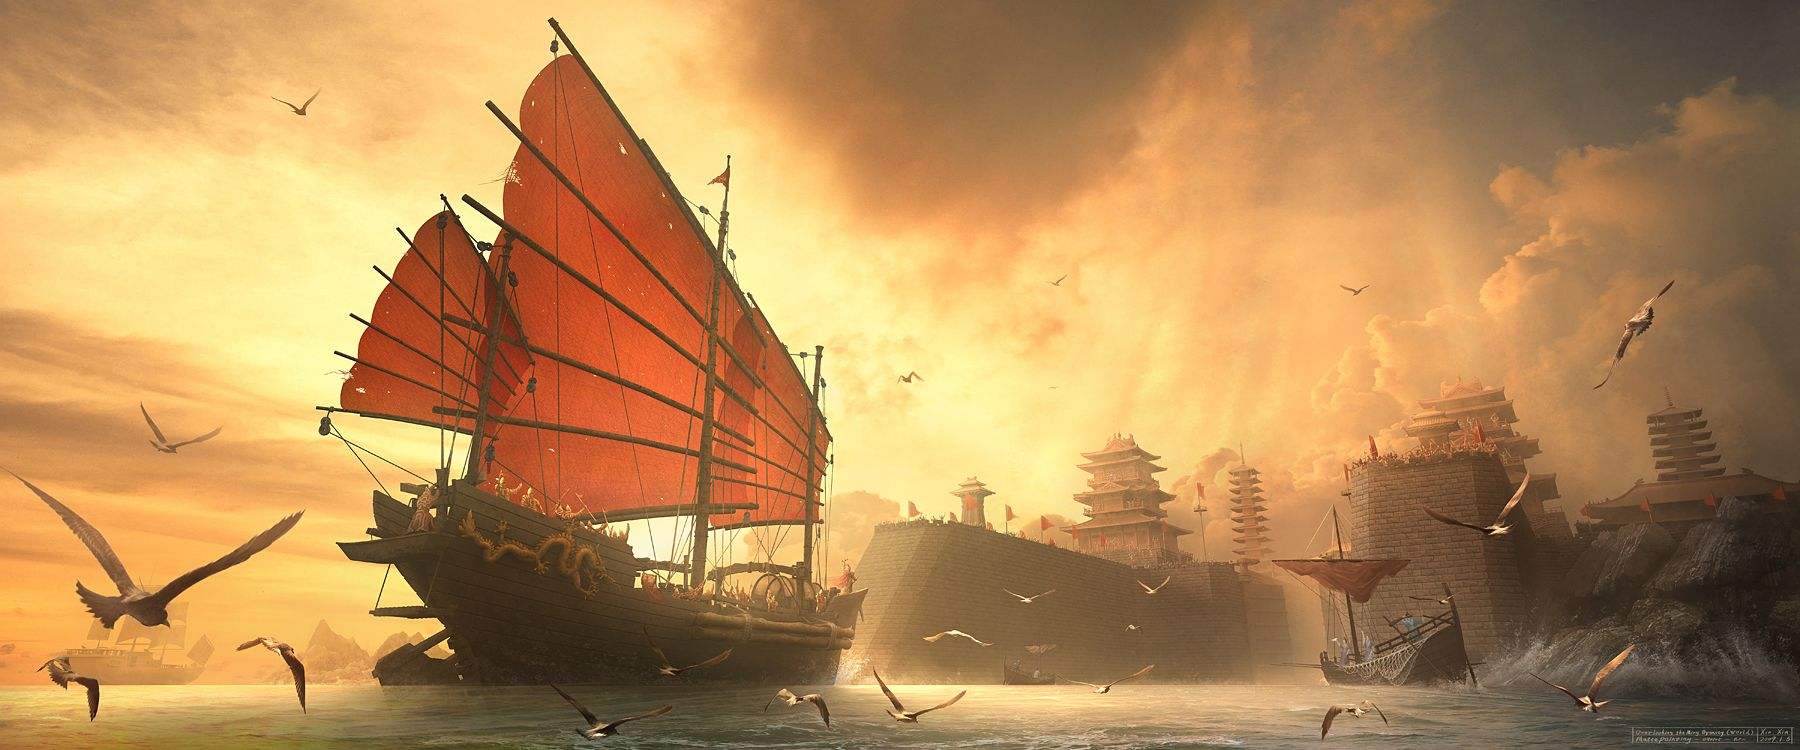 Boat Art Sailing Ships Fantasy Pictures